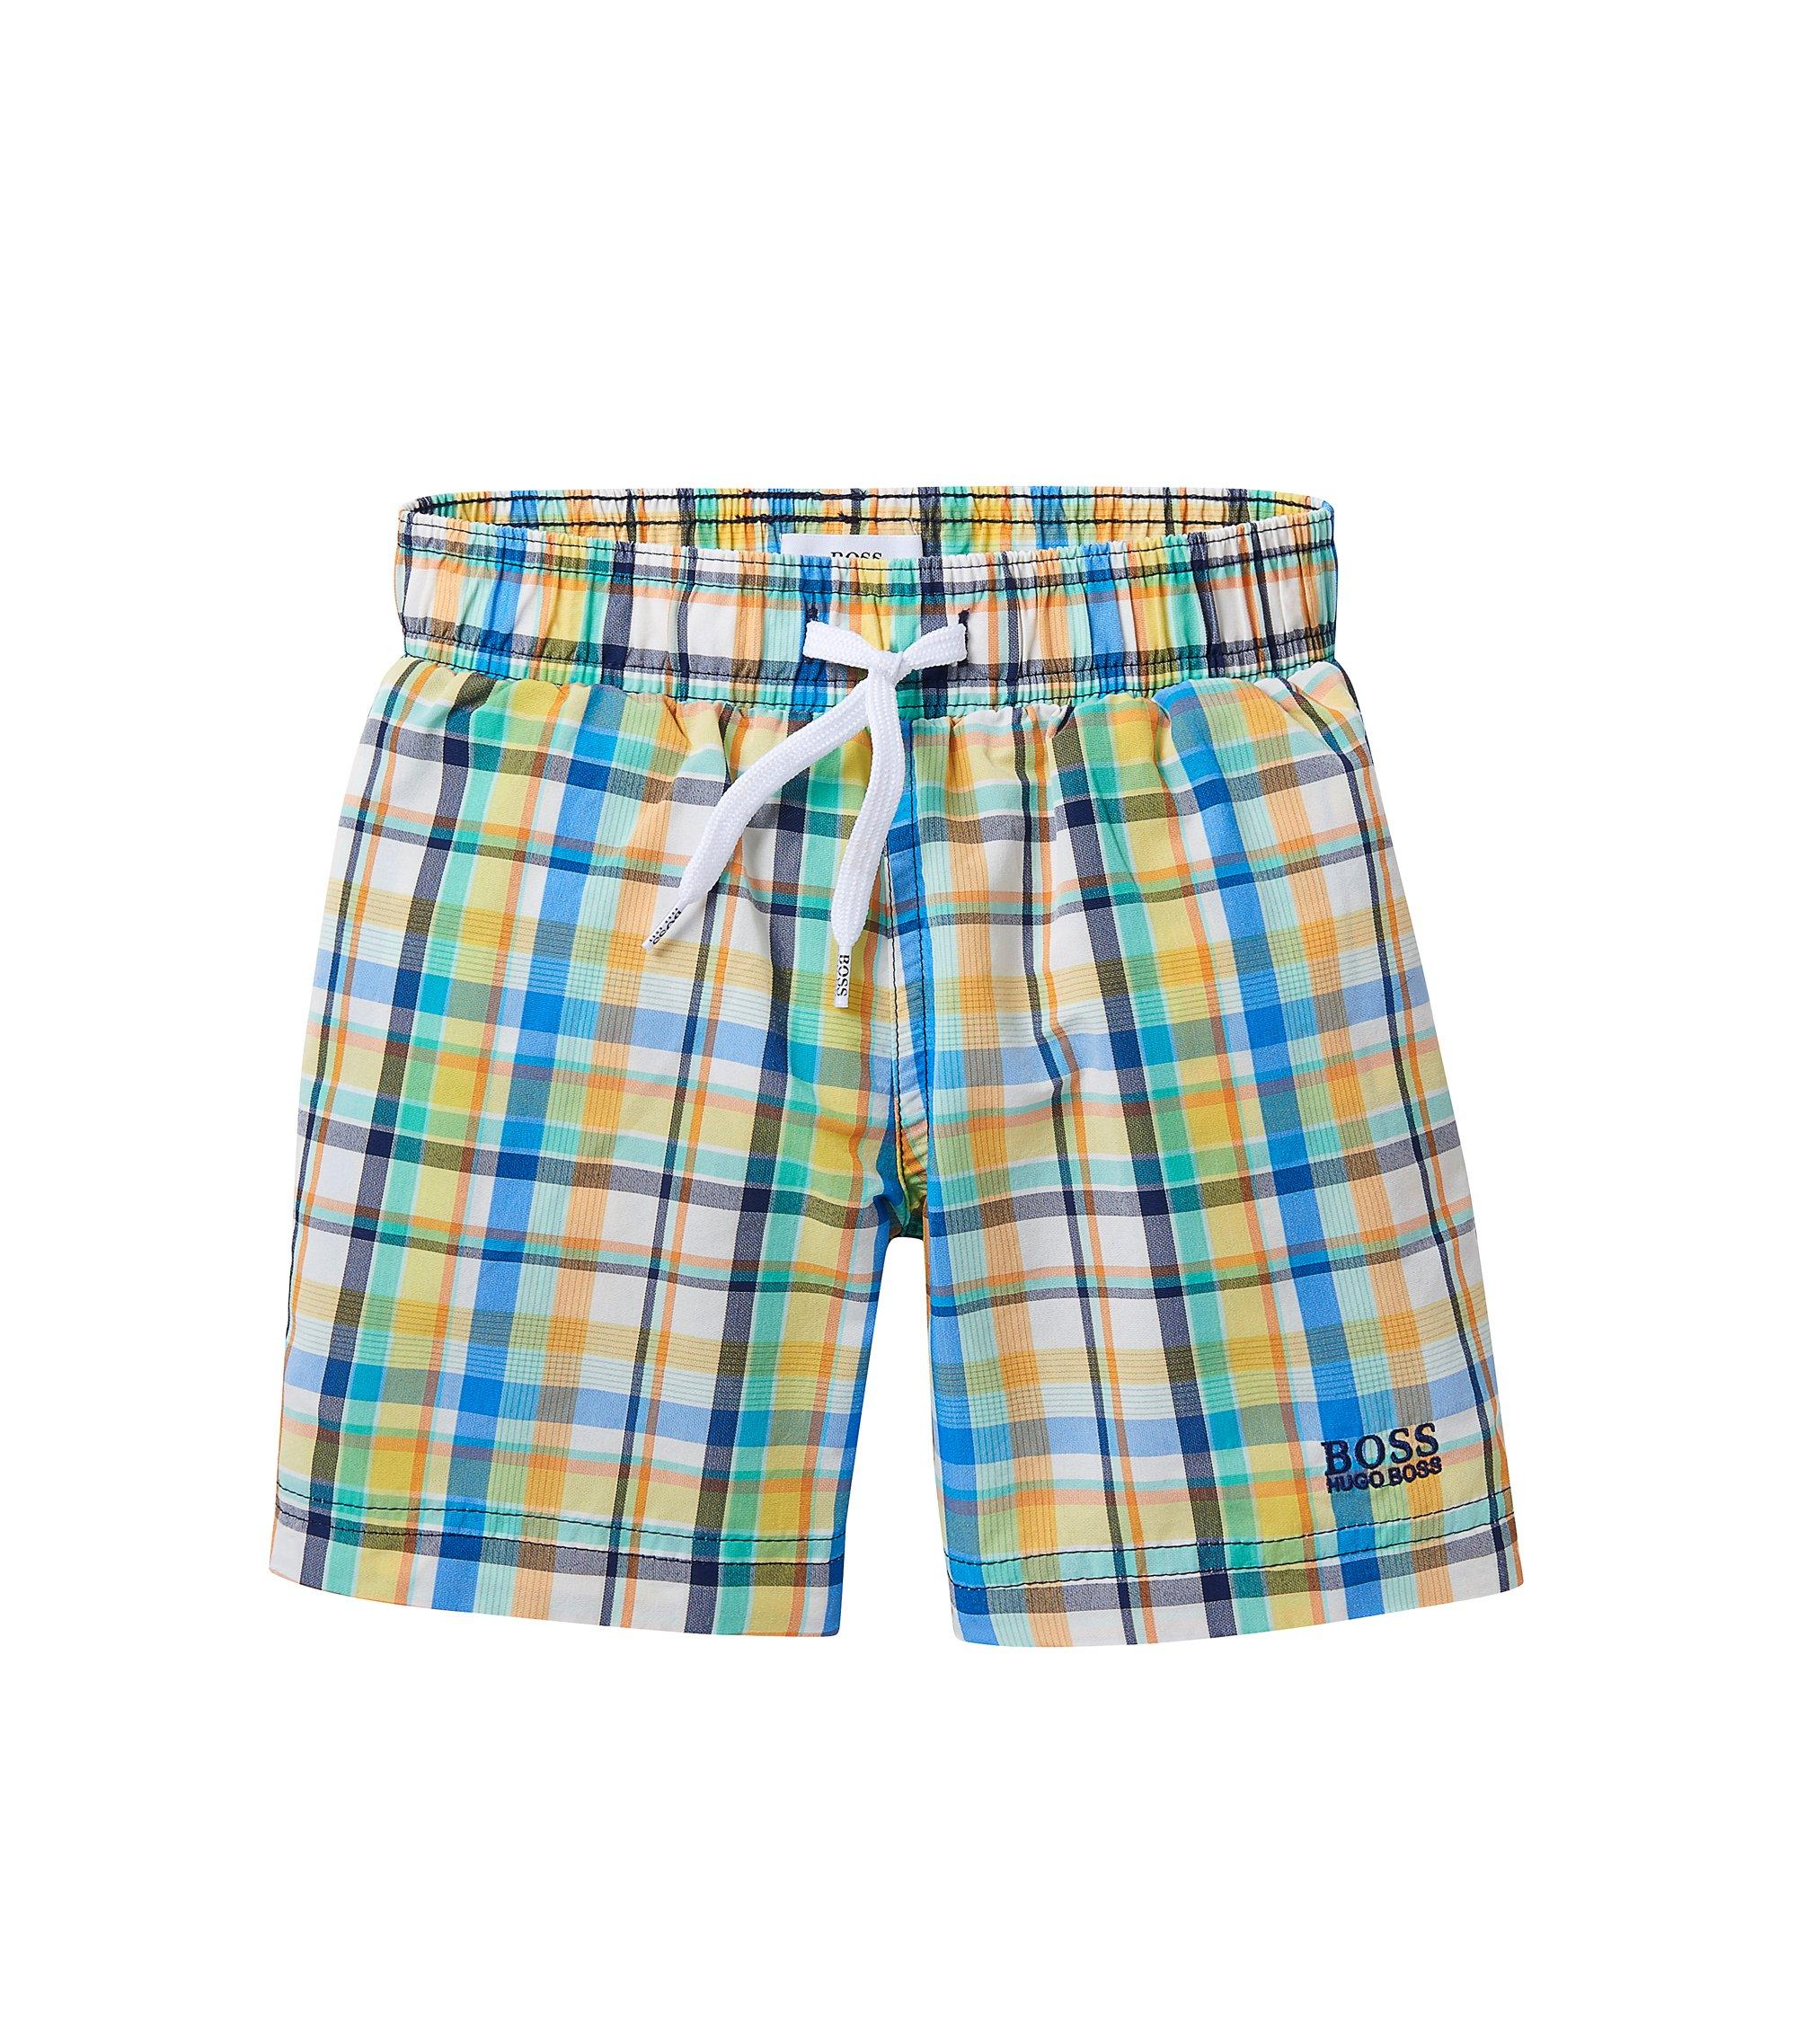 'J24405' | Boys Stretch Cotton Quick Dry Swim Trunks, Green